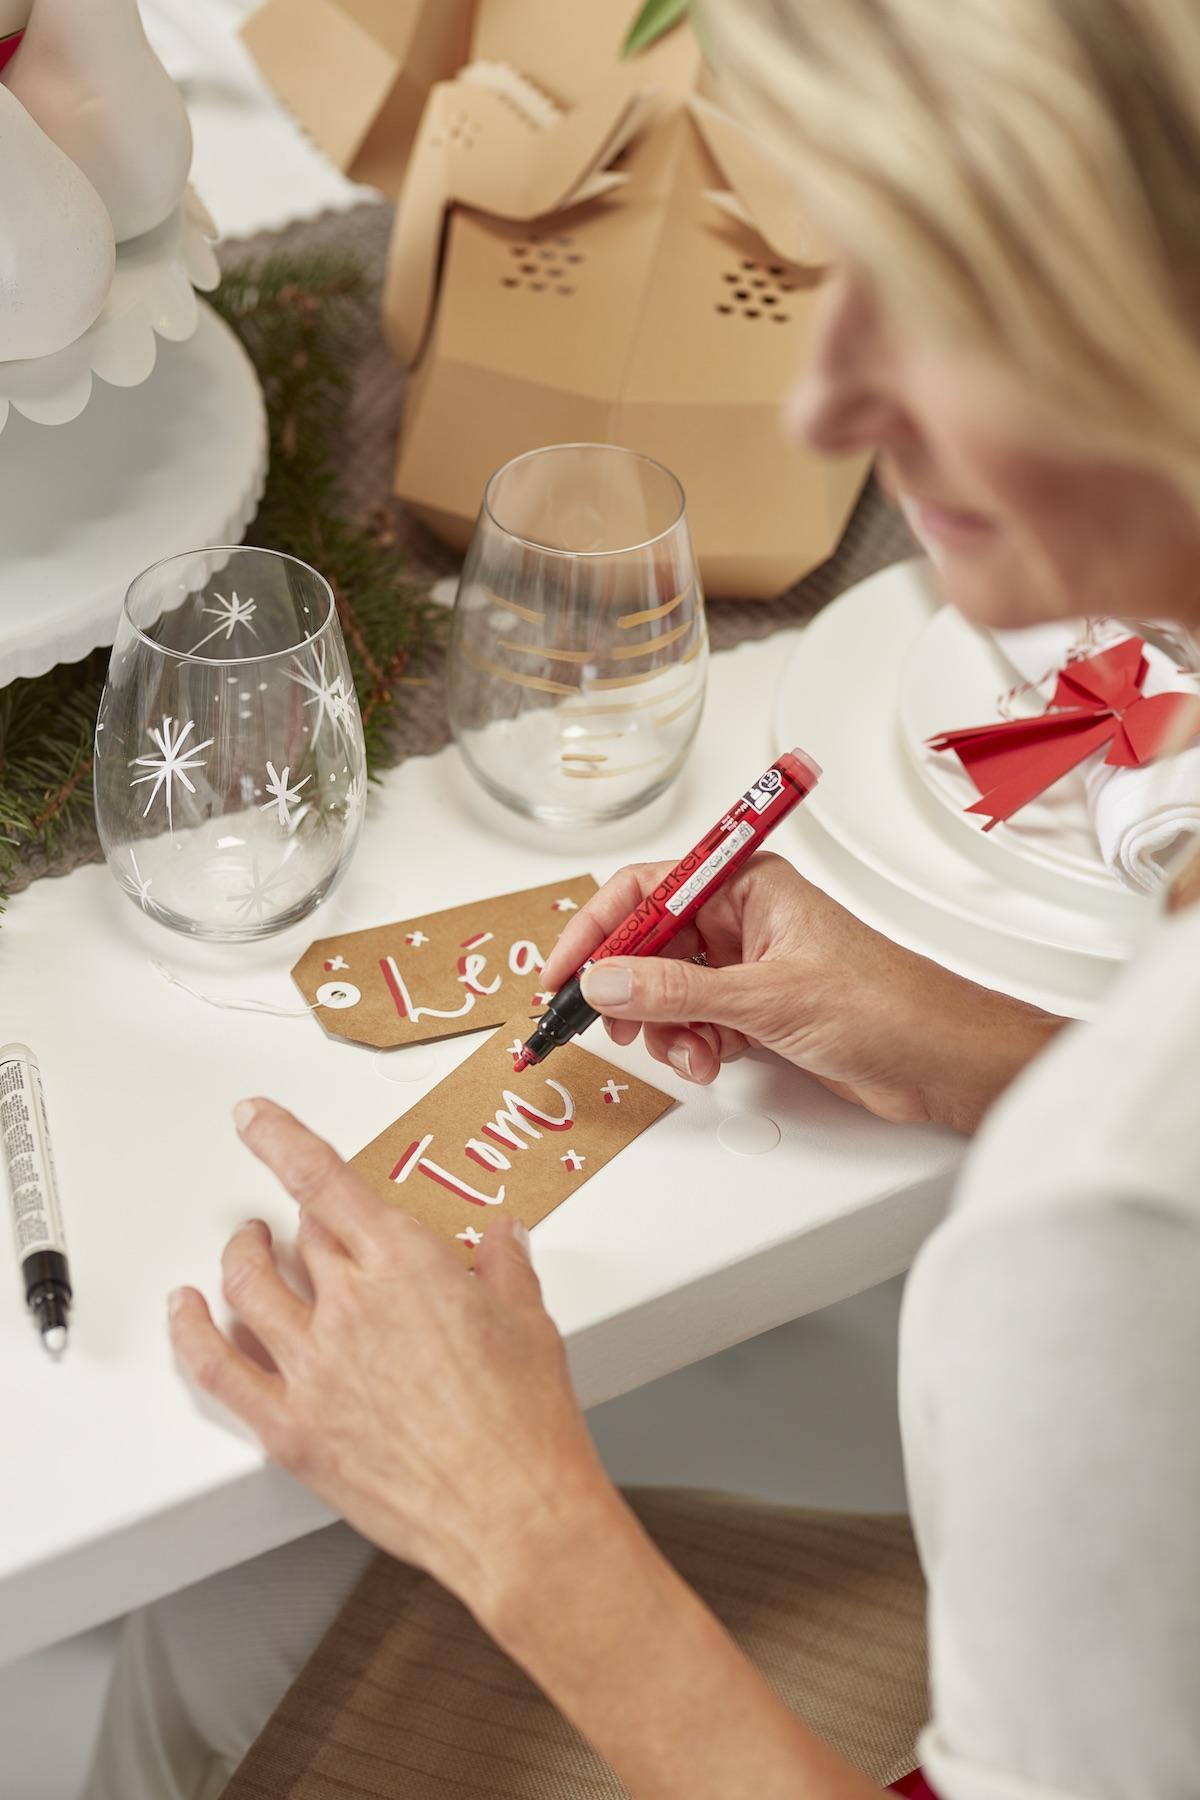 miss-cloudy-pauline-loctin-de-serres-christmas-campaign-origami-paper-art-folding-4.jpg